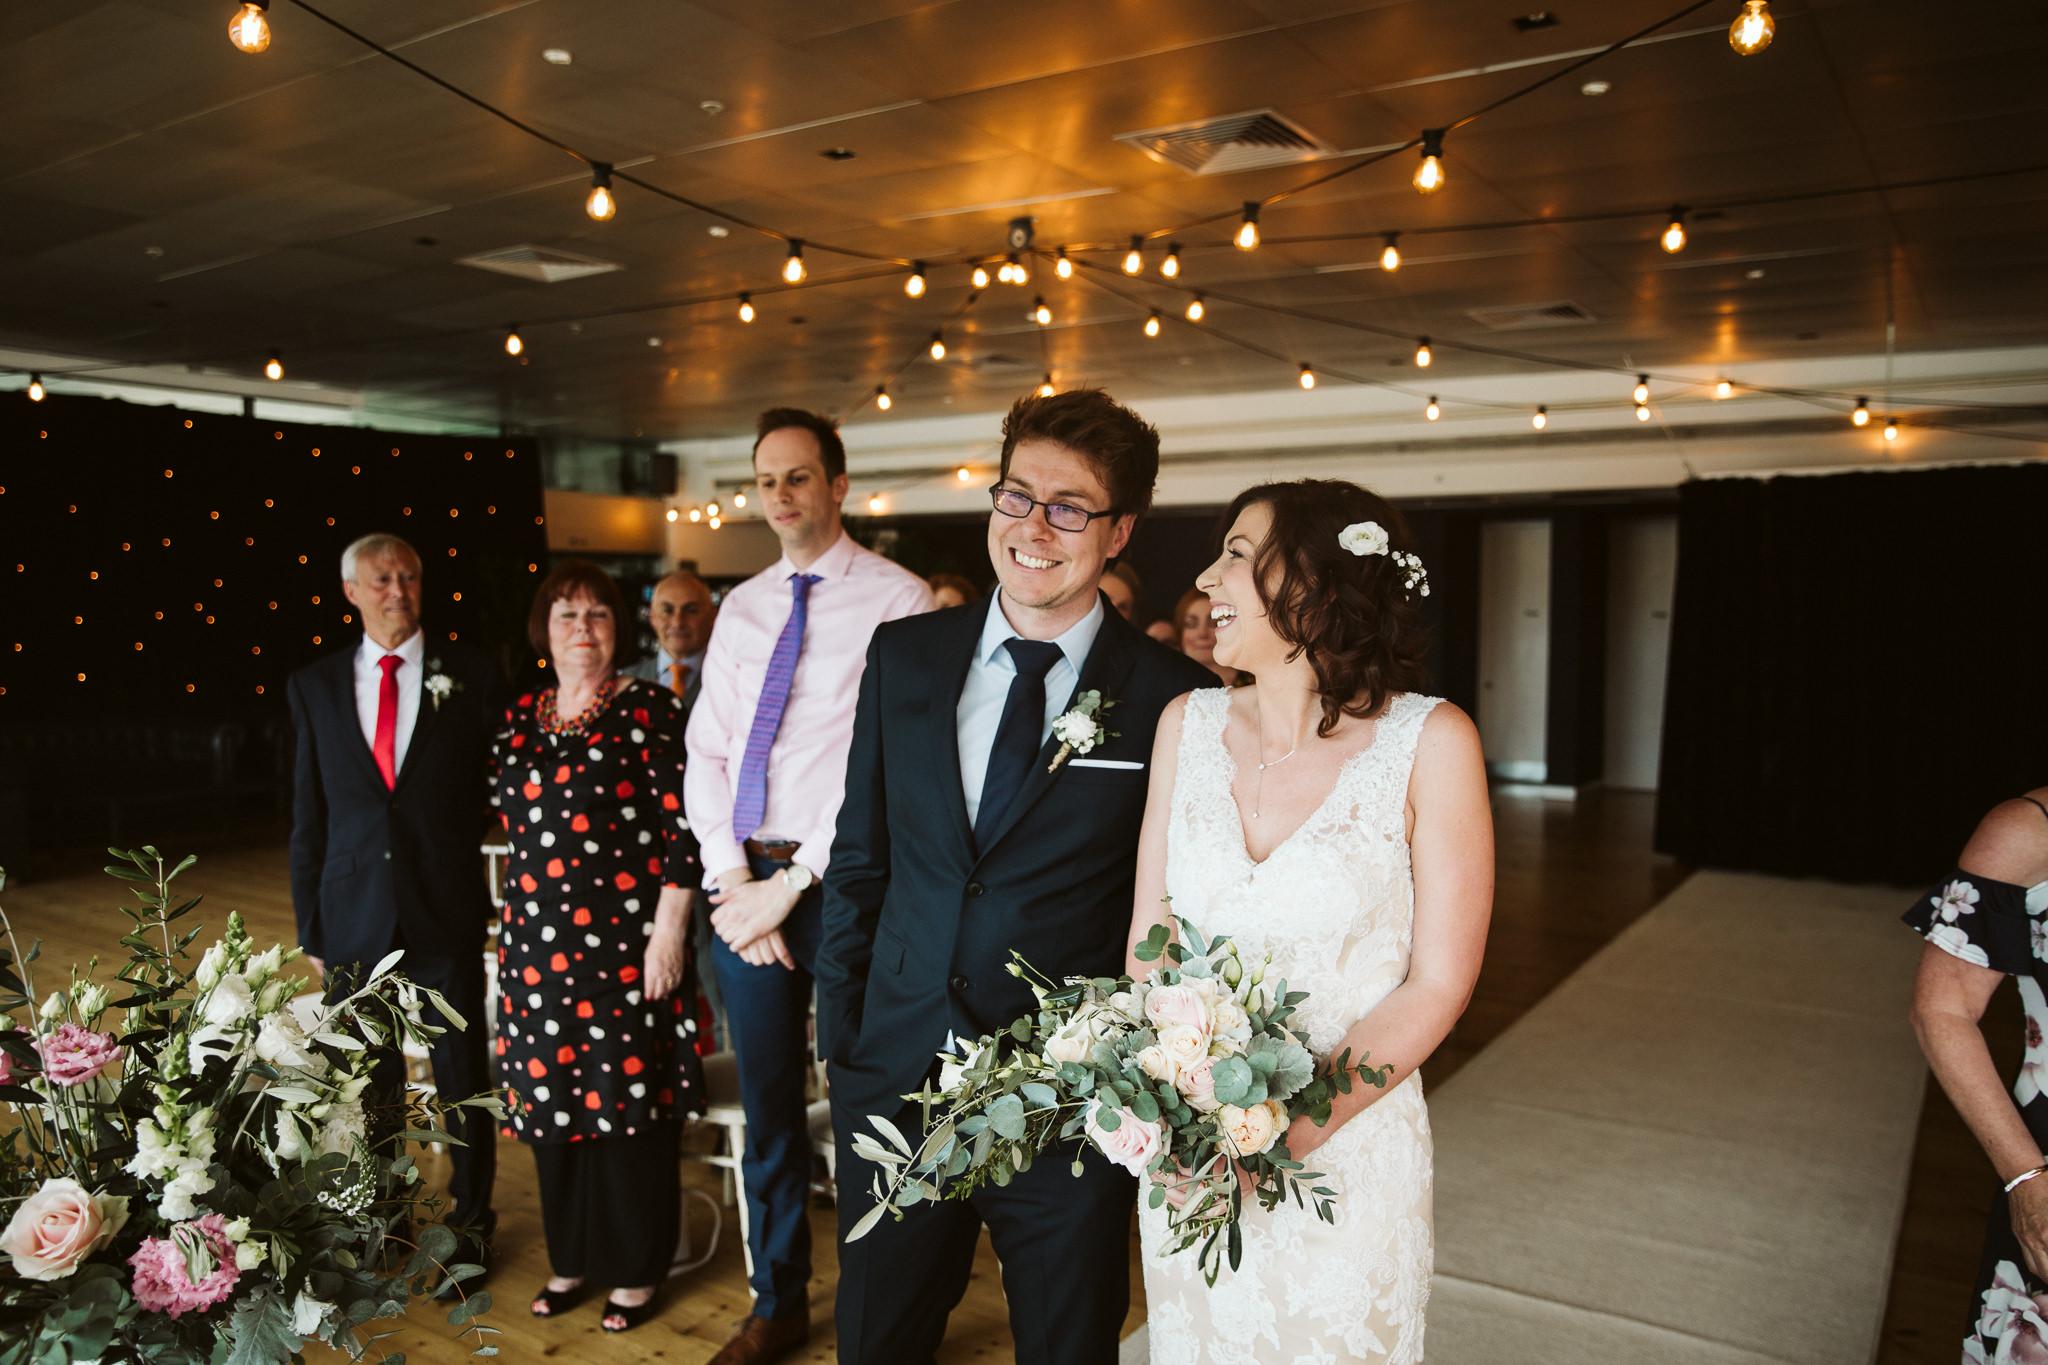 baltic-wedding-margarita-hope (21).jpg